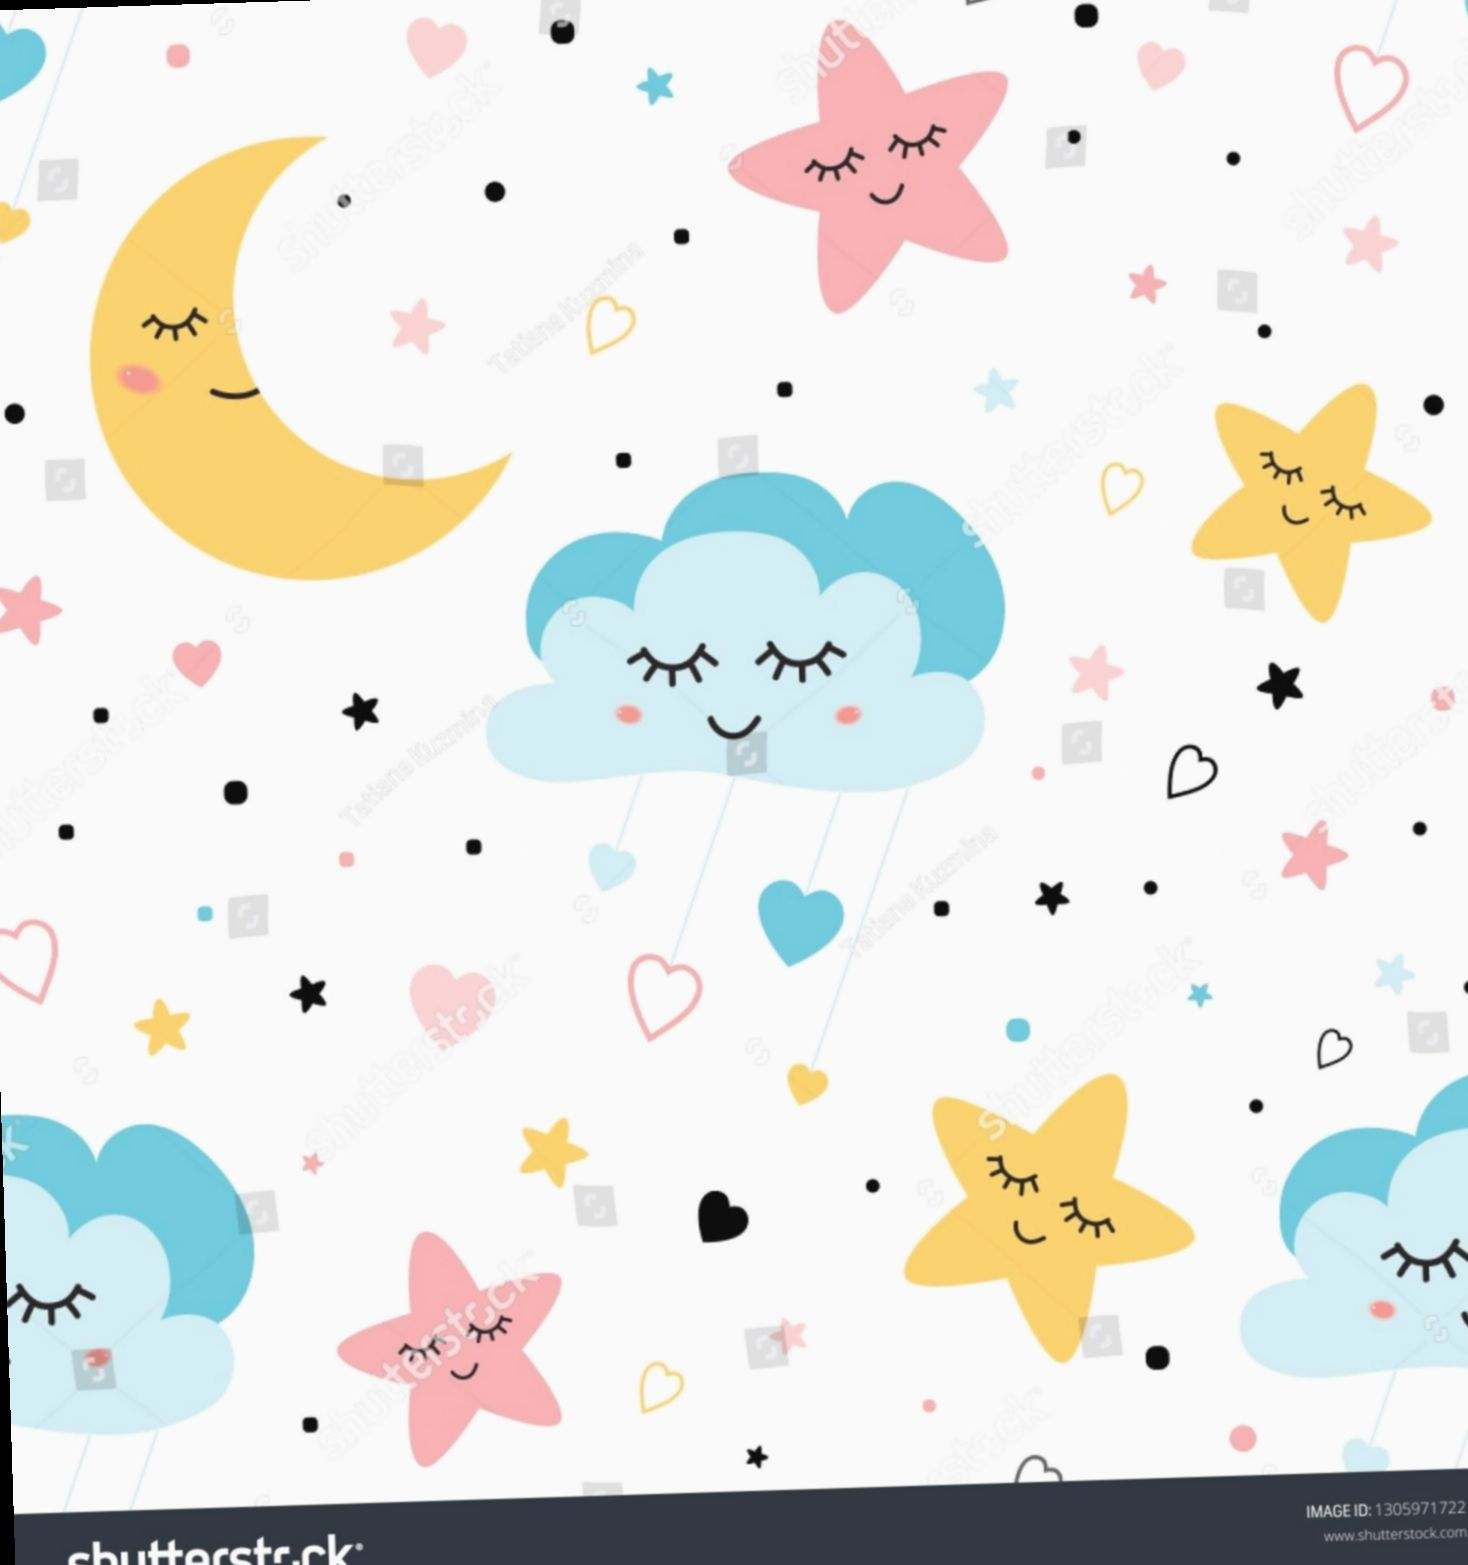 14 Wallpaper Ipad Disney People Star Illustration Baby Blue Wallpaper Ipad Wallpaper